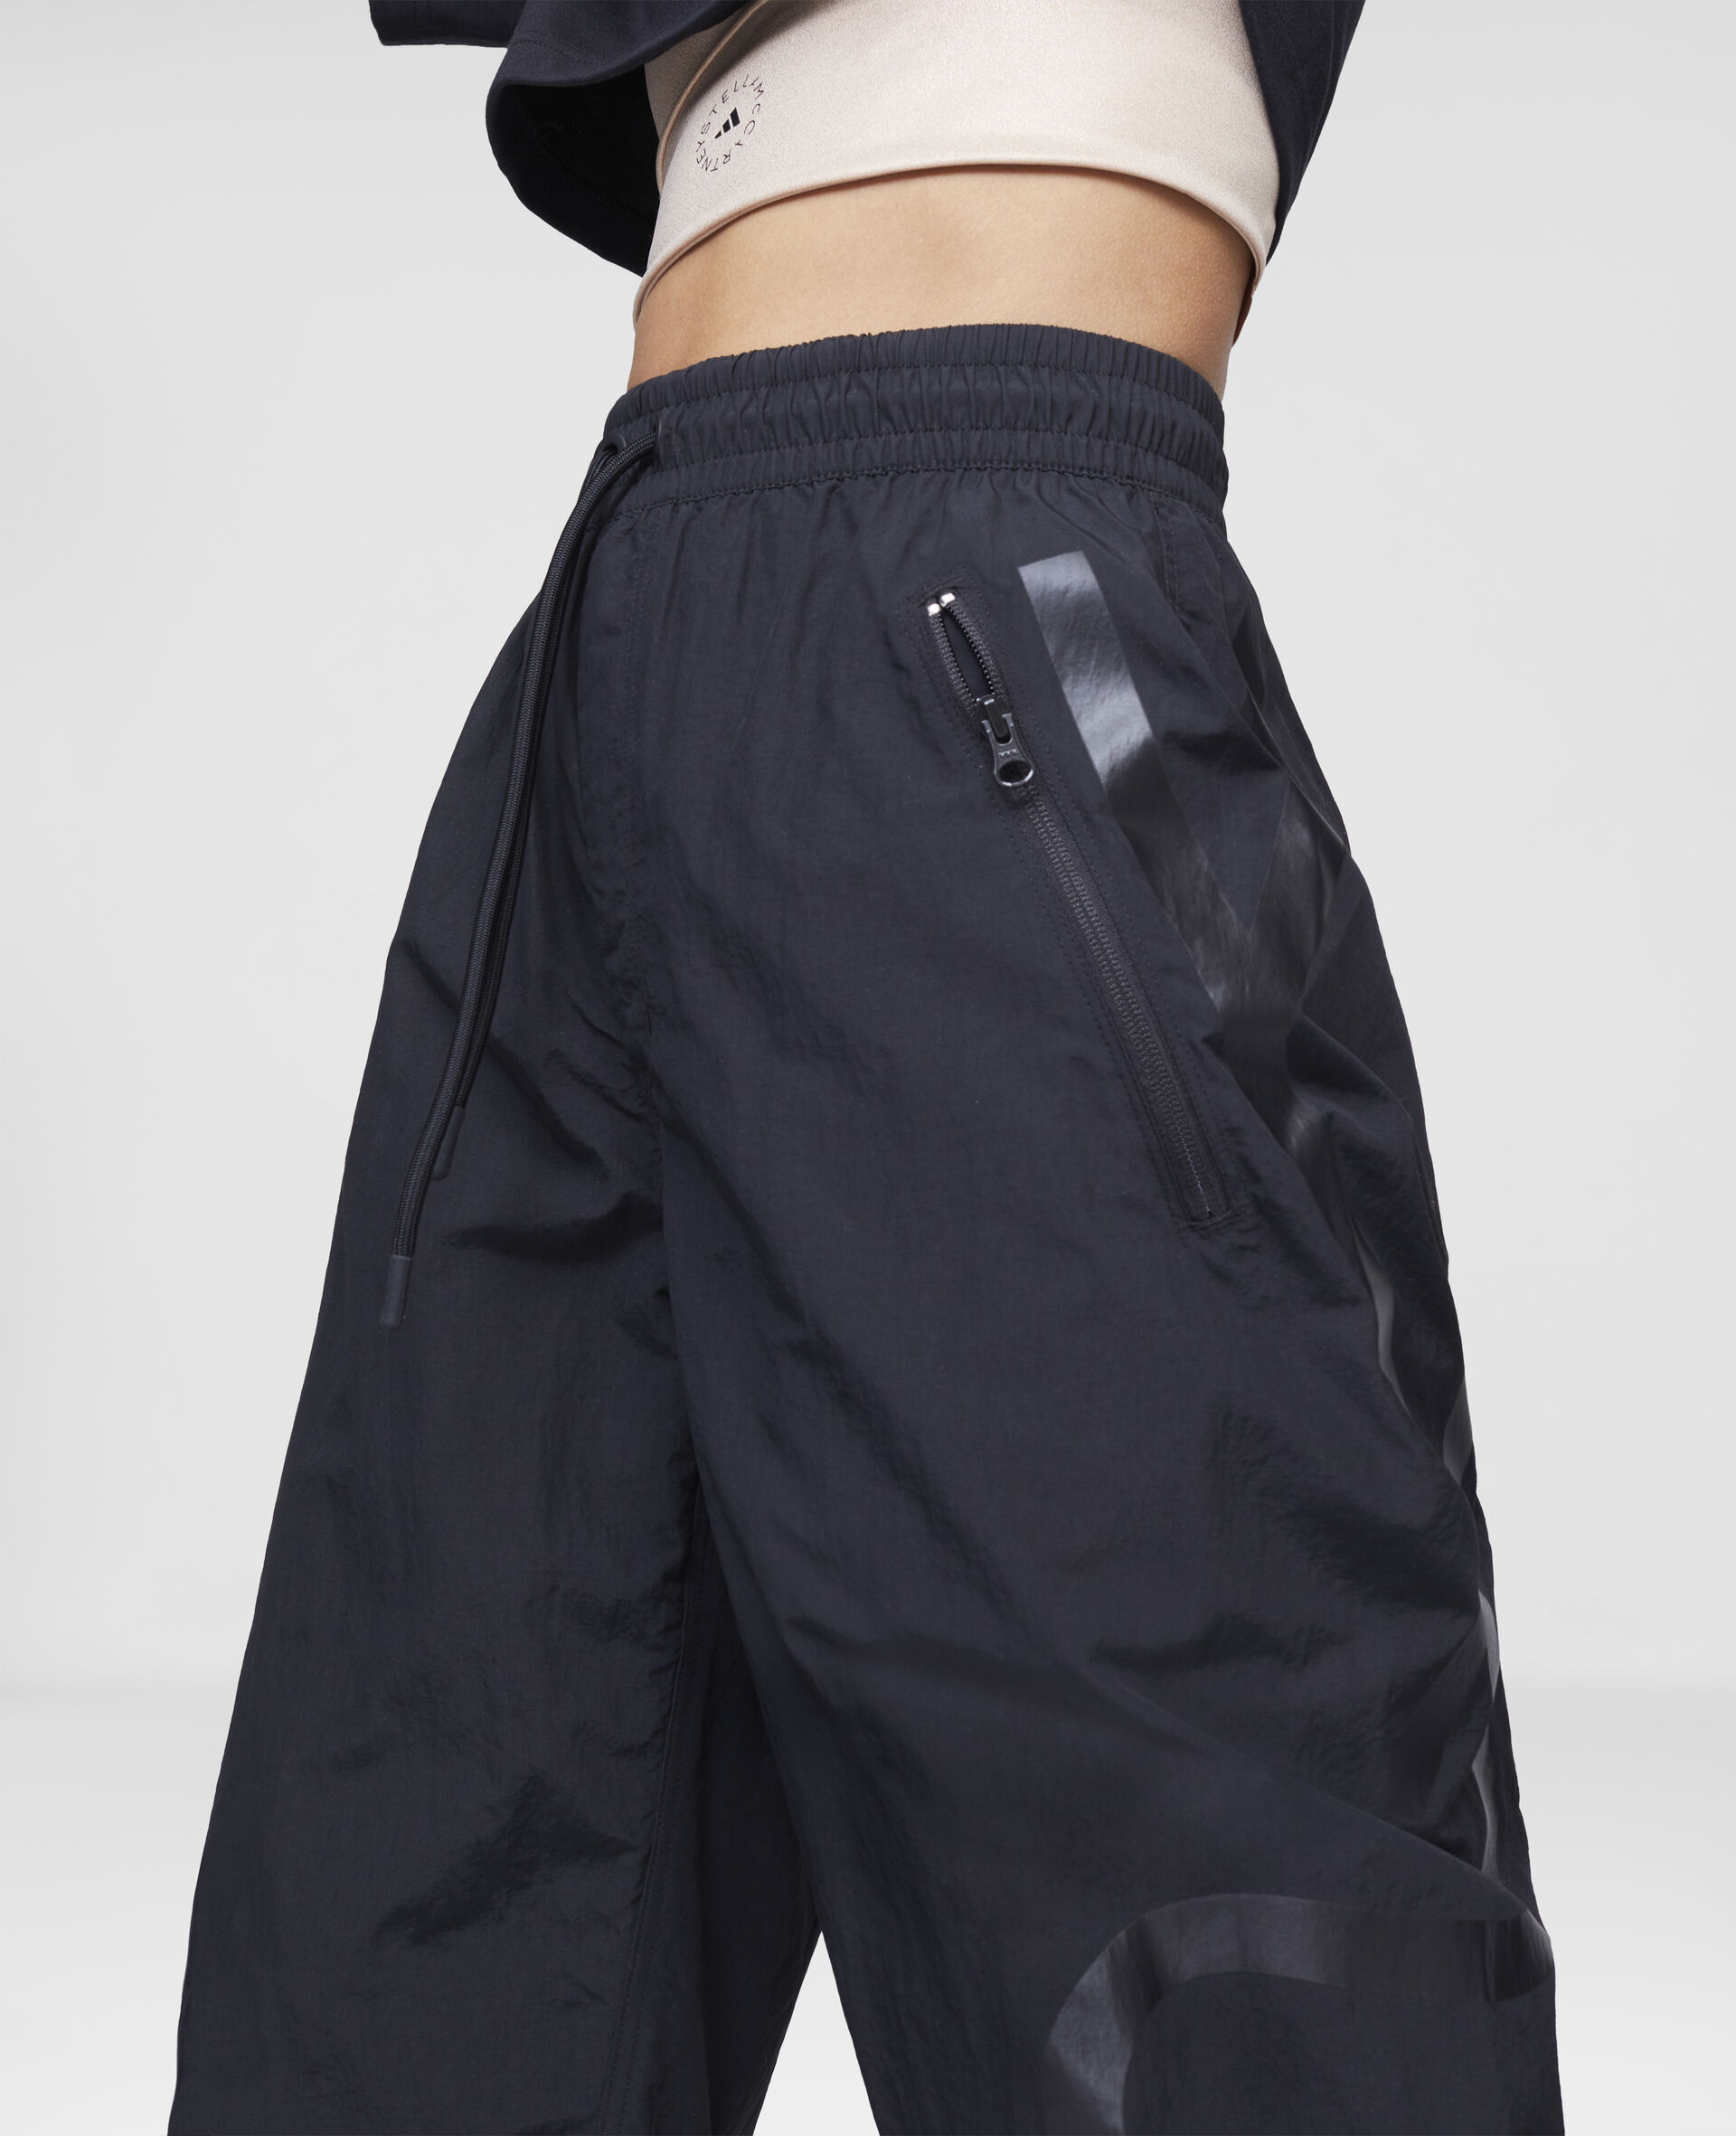 黑色编织训练长裤-黑色-large image number 3